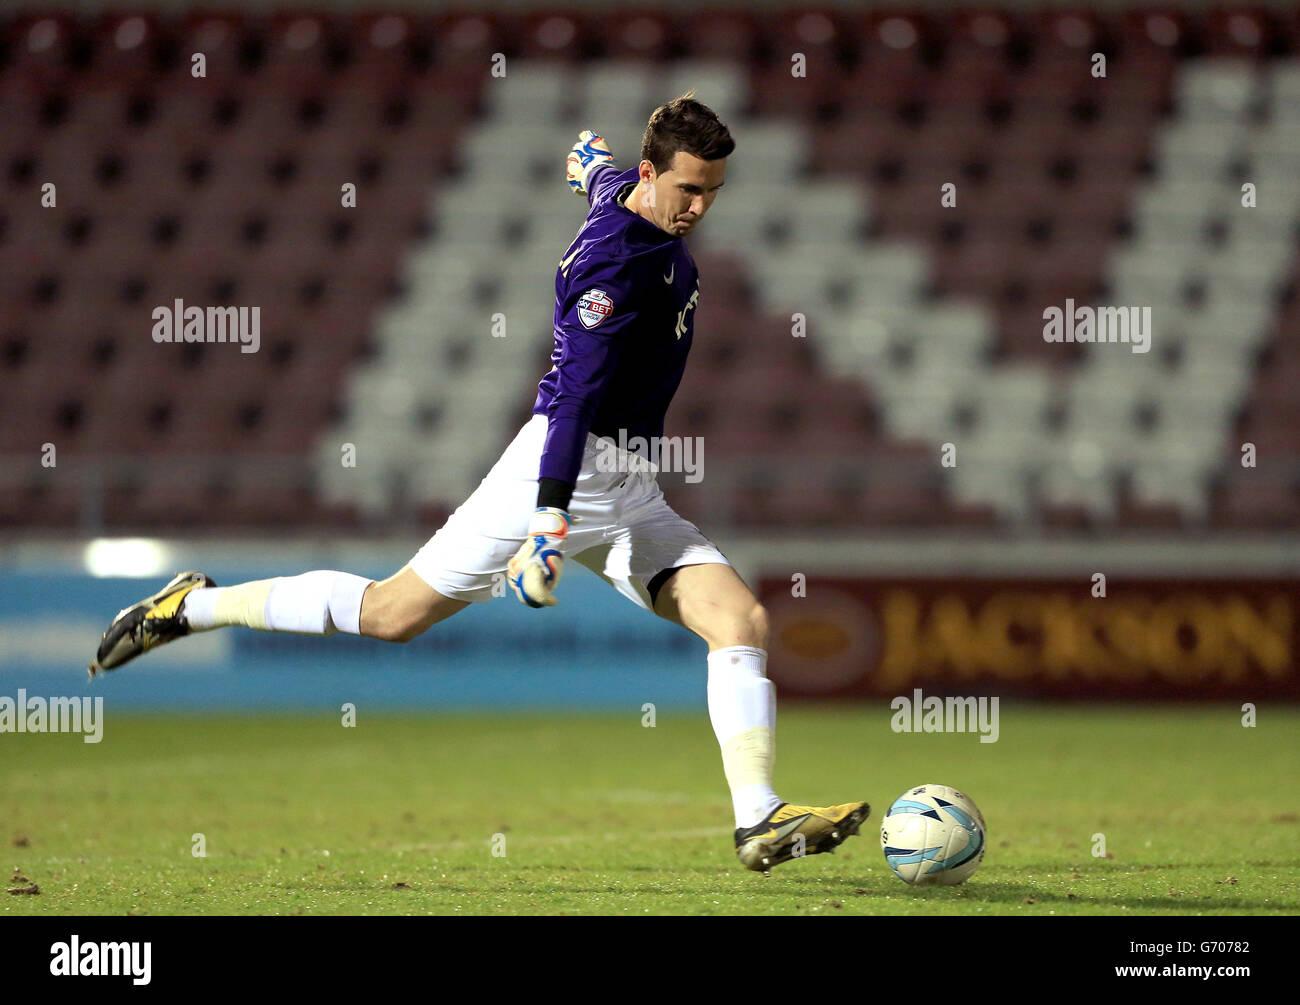 Soccer - Sky Bet League One - Coventry City v Bradford City - Sixfields Stadium - Stock Image